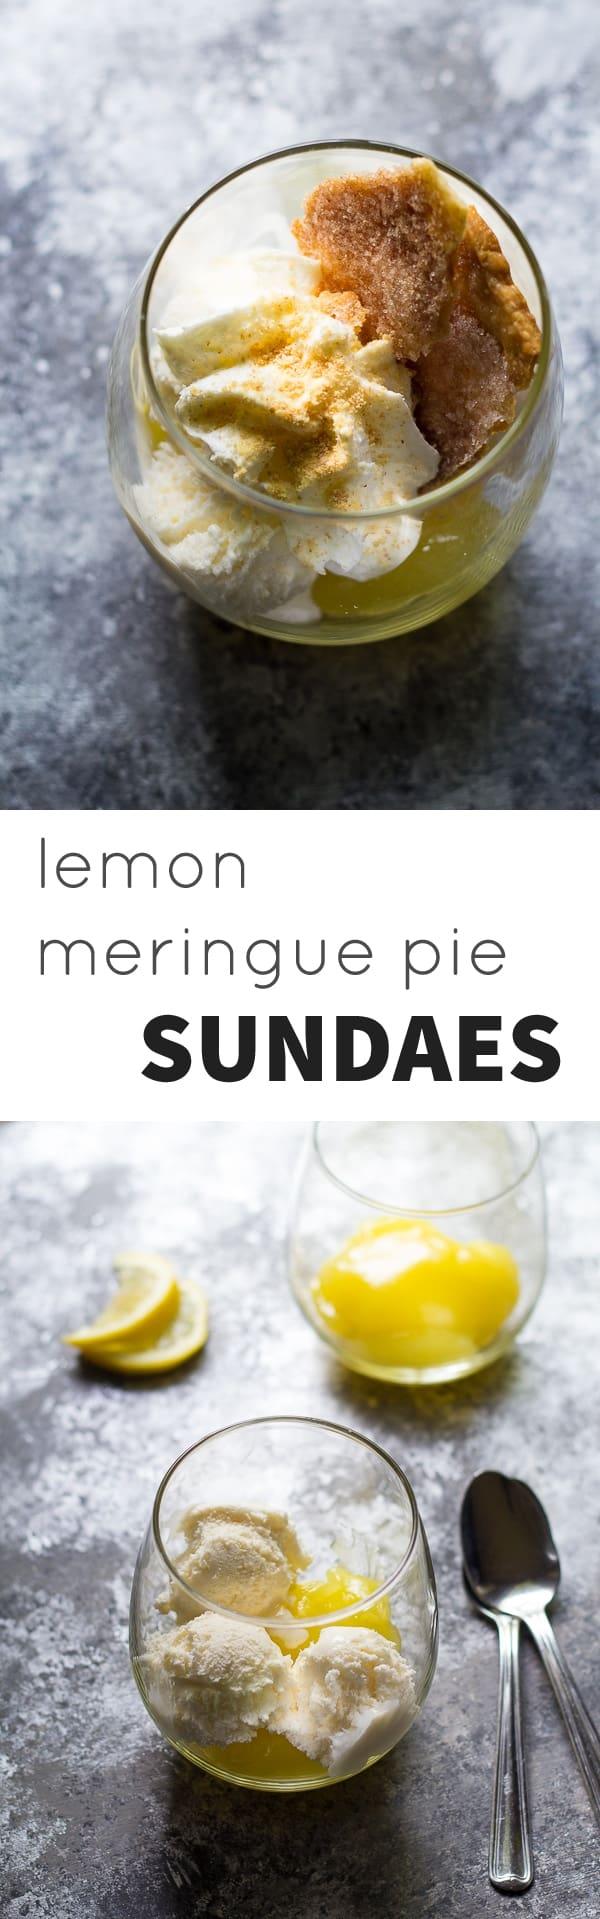 Lemon Curd Ice Cream Sundaes